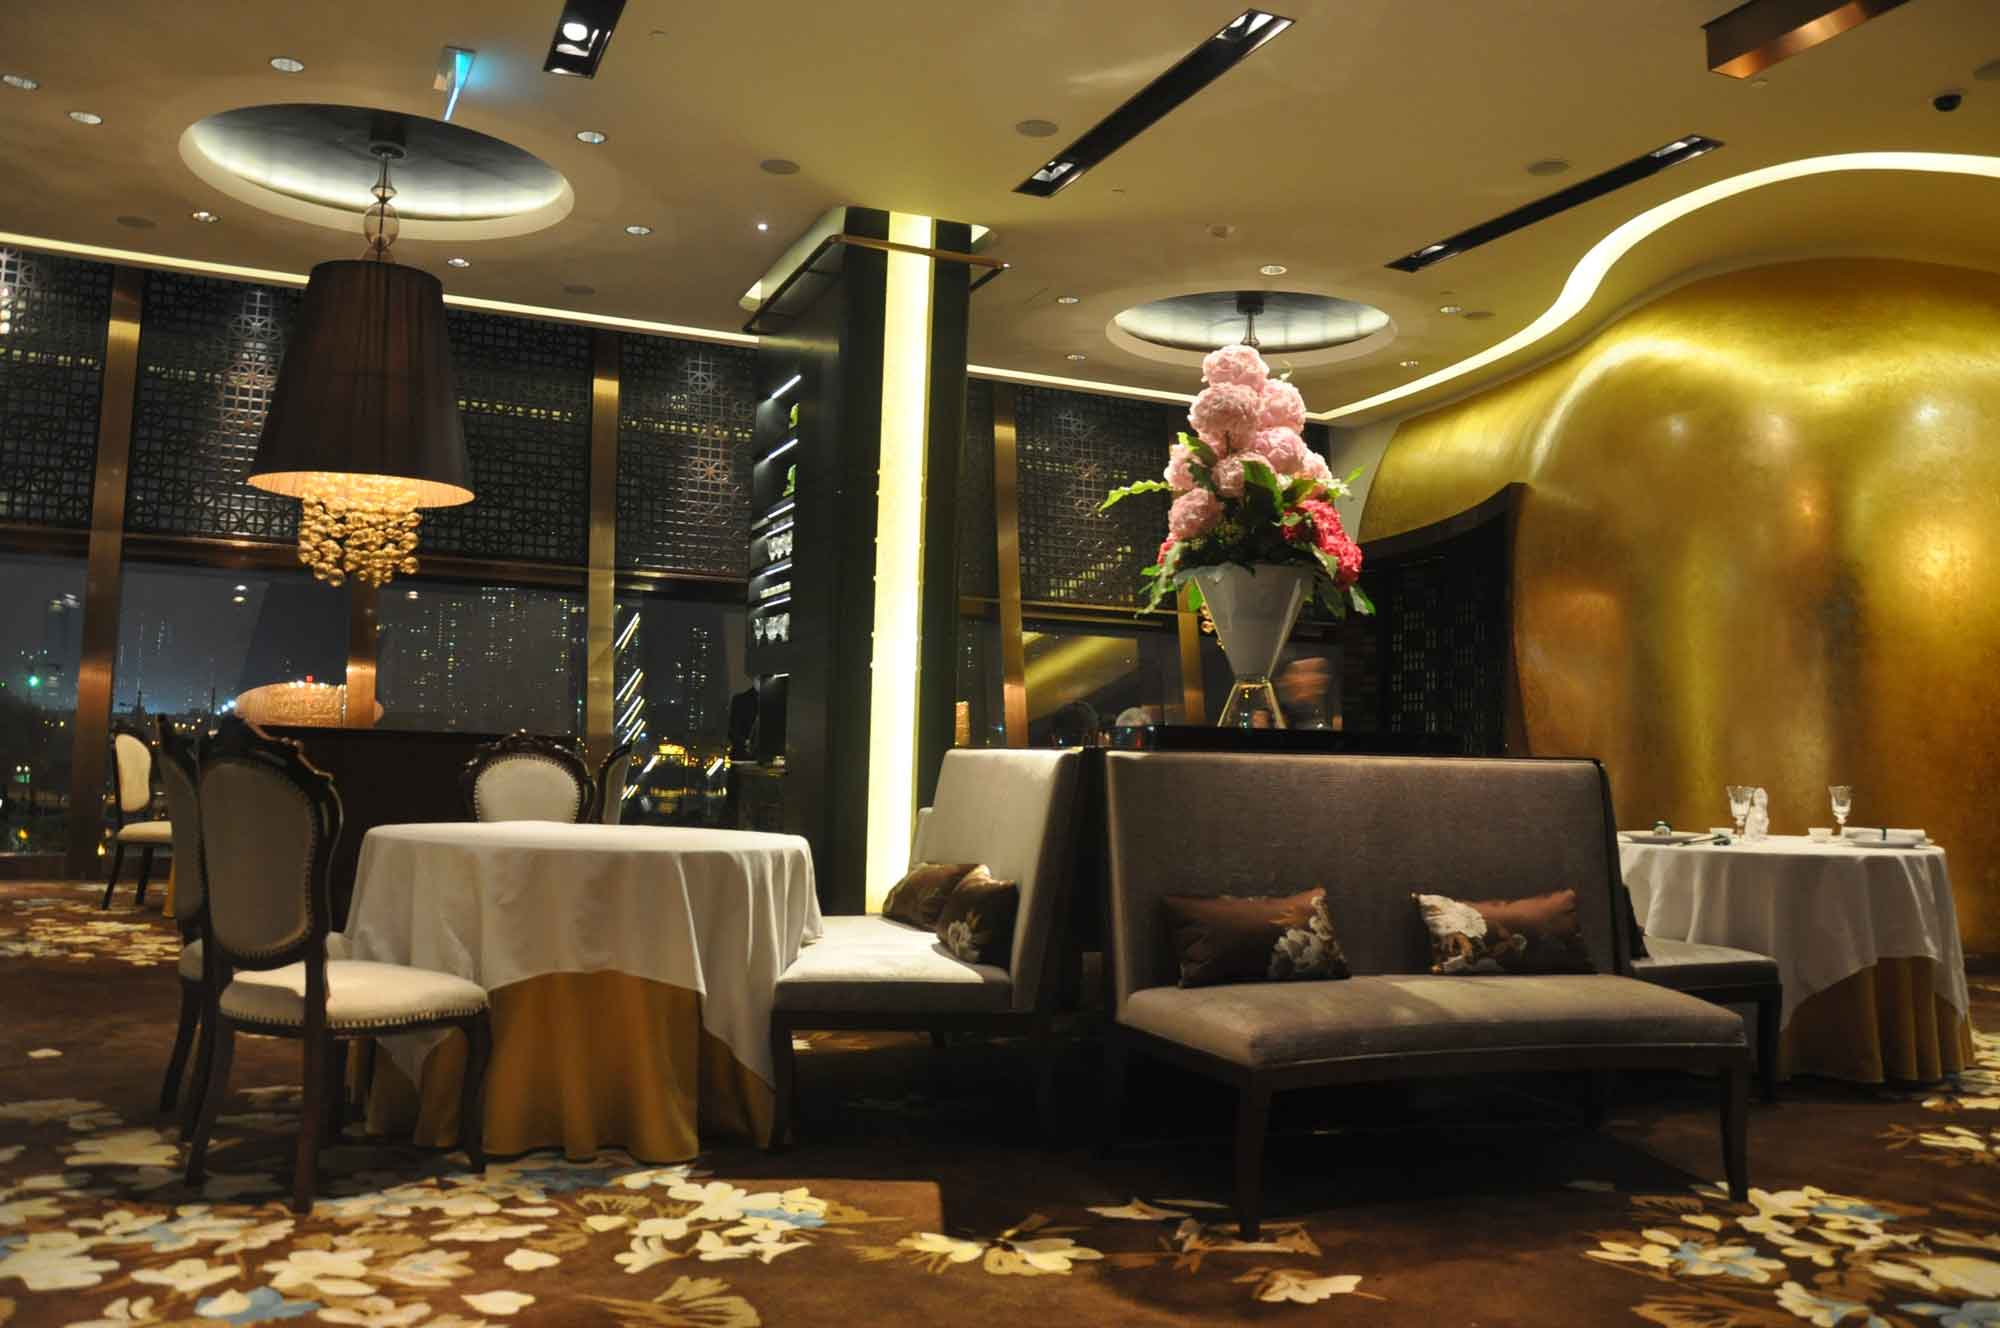 Jade Dragon Macau tables and chairs